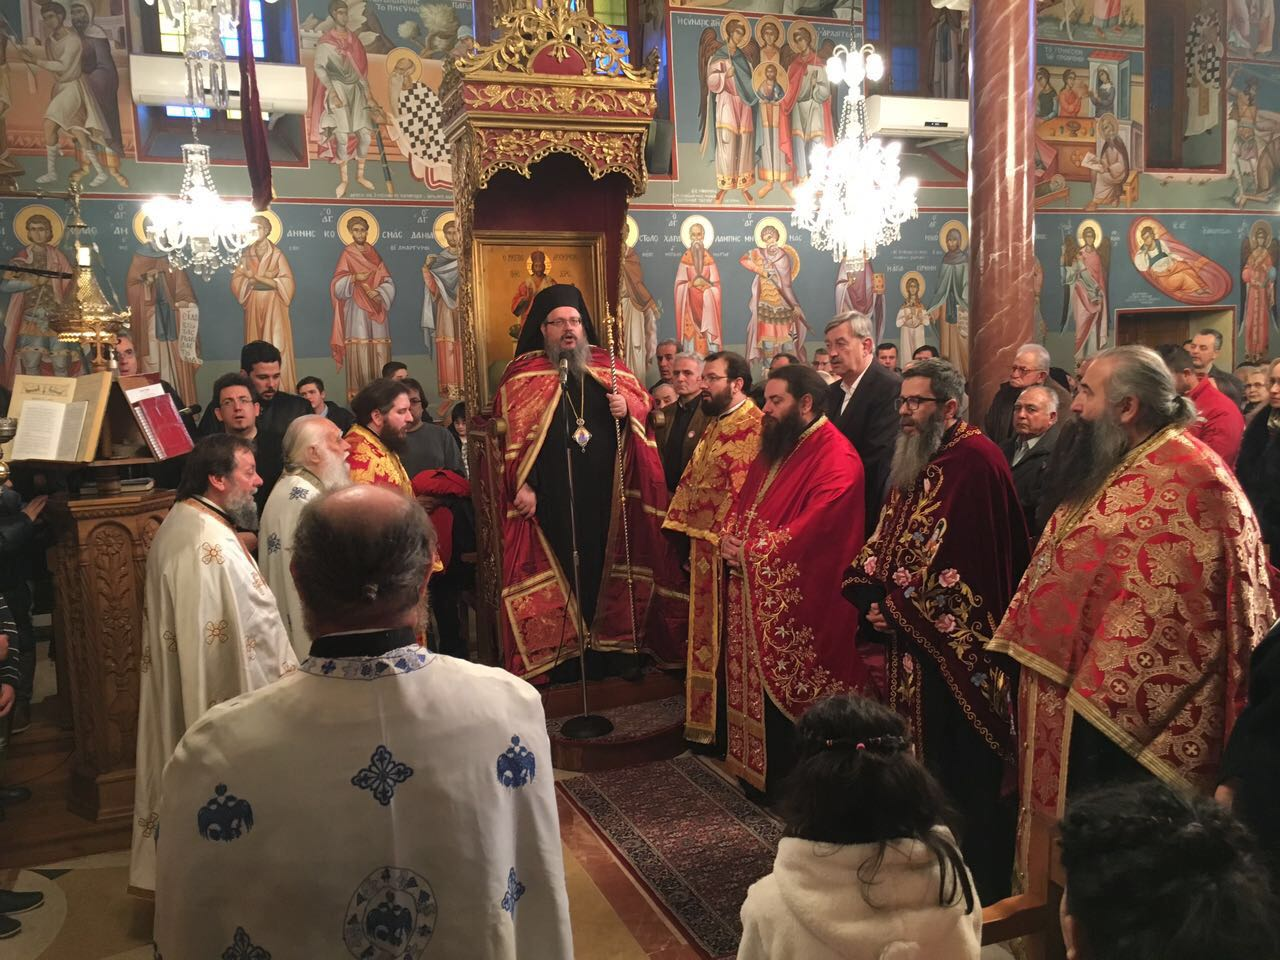 AgXaralampos Nikaia 2019 4 - Στον πανηγυρικό εσπερινό του Αγίου Χαραλάμπους Νικαίας ο Σεβασμιώτατος